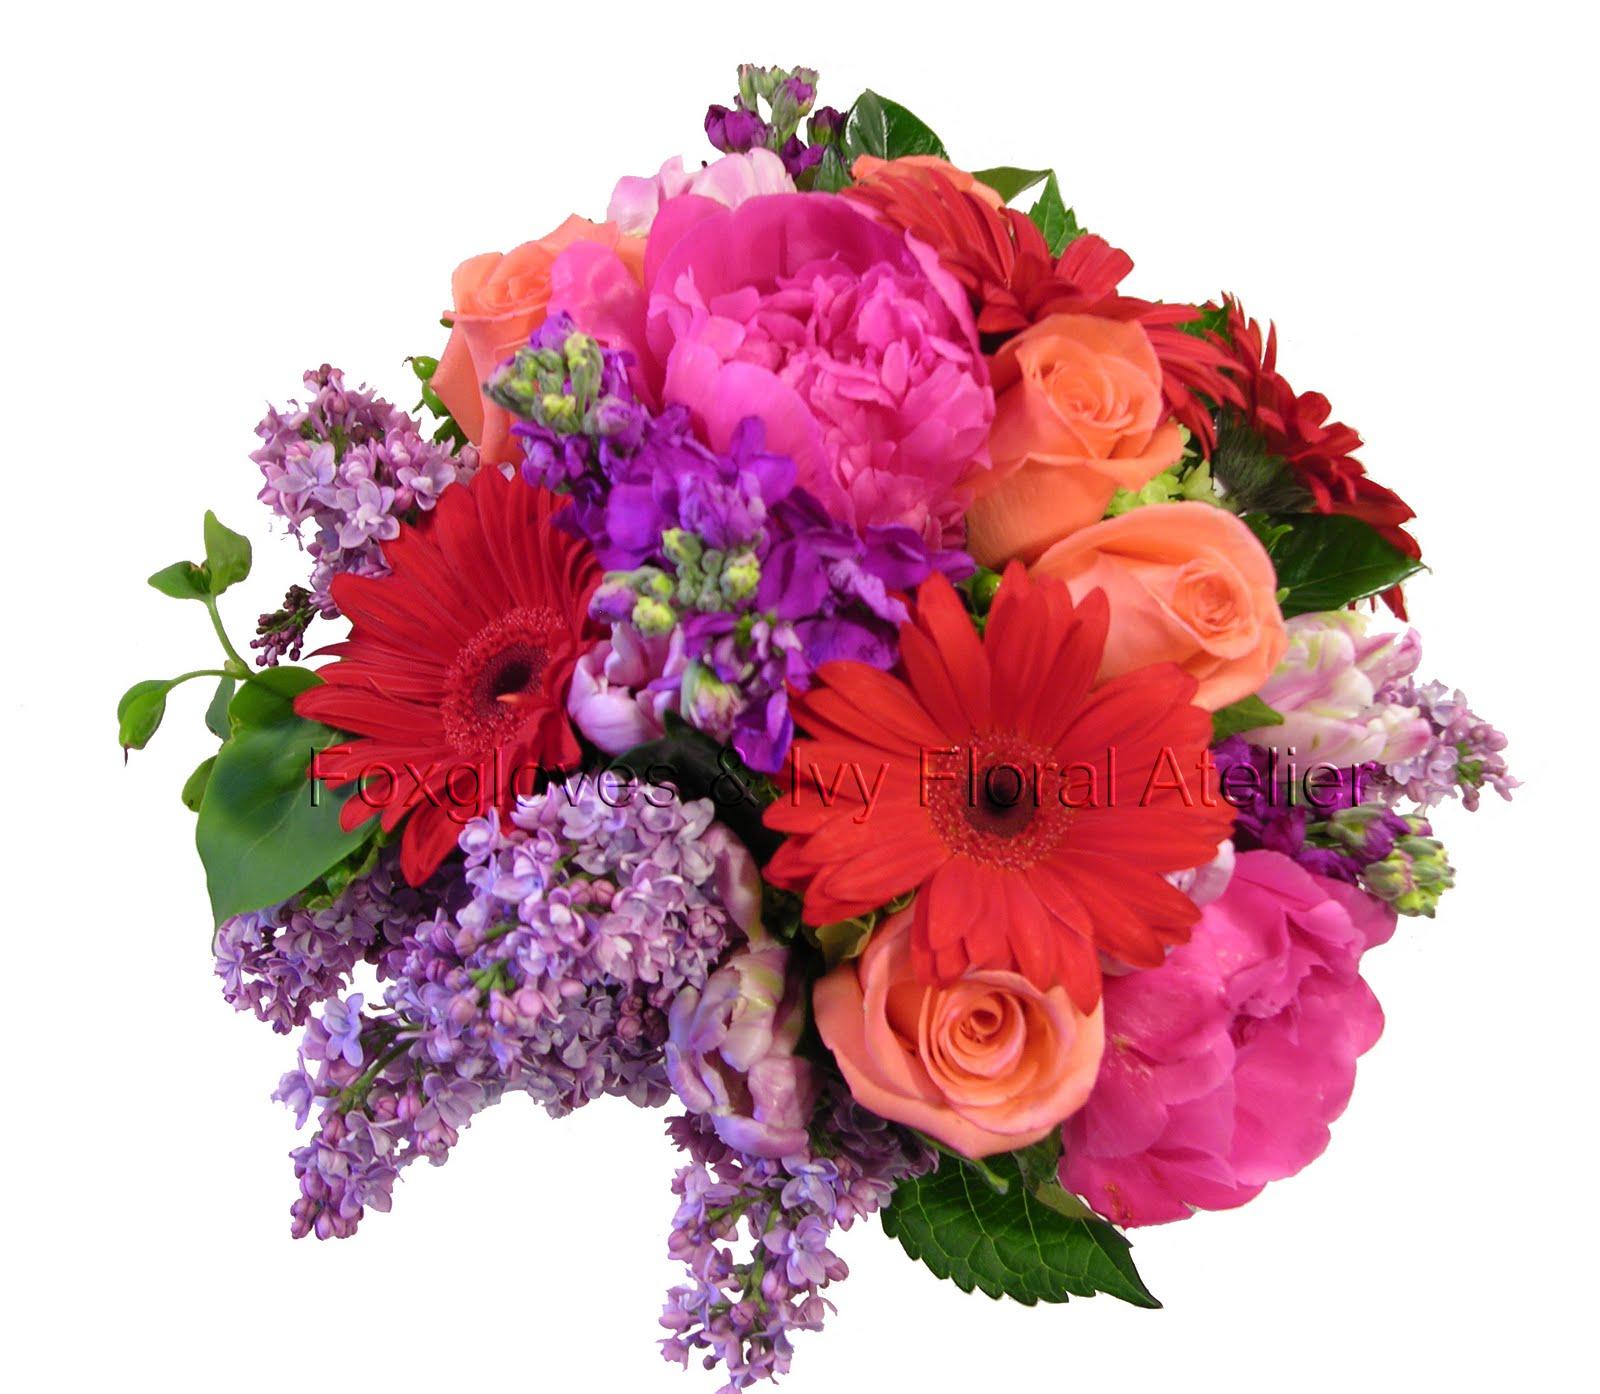 Foxgloves & Ivy Floral Design Studio: 2010-04-25